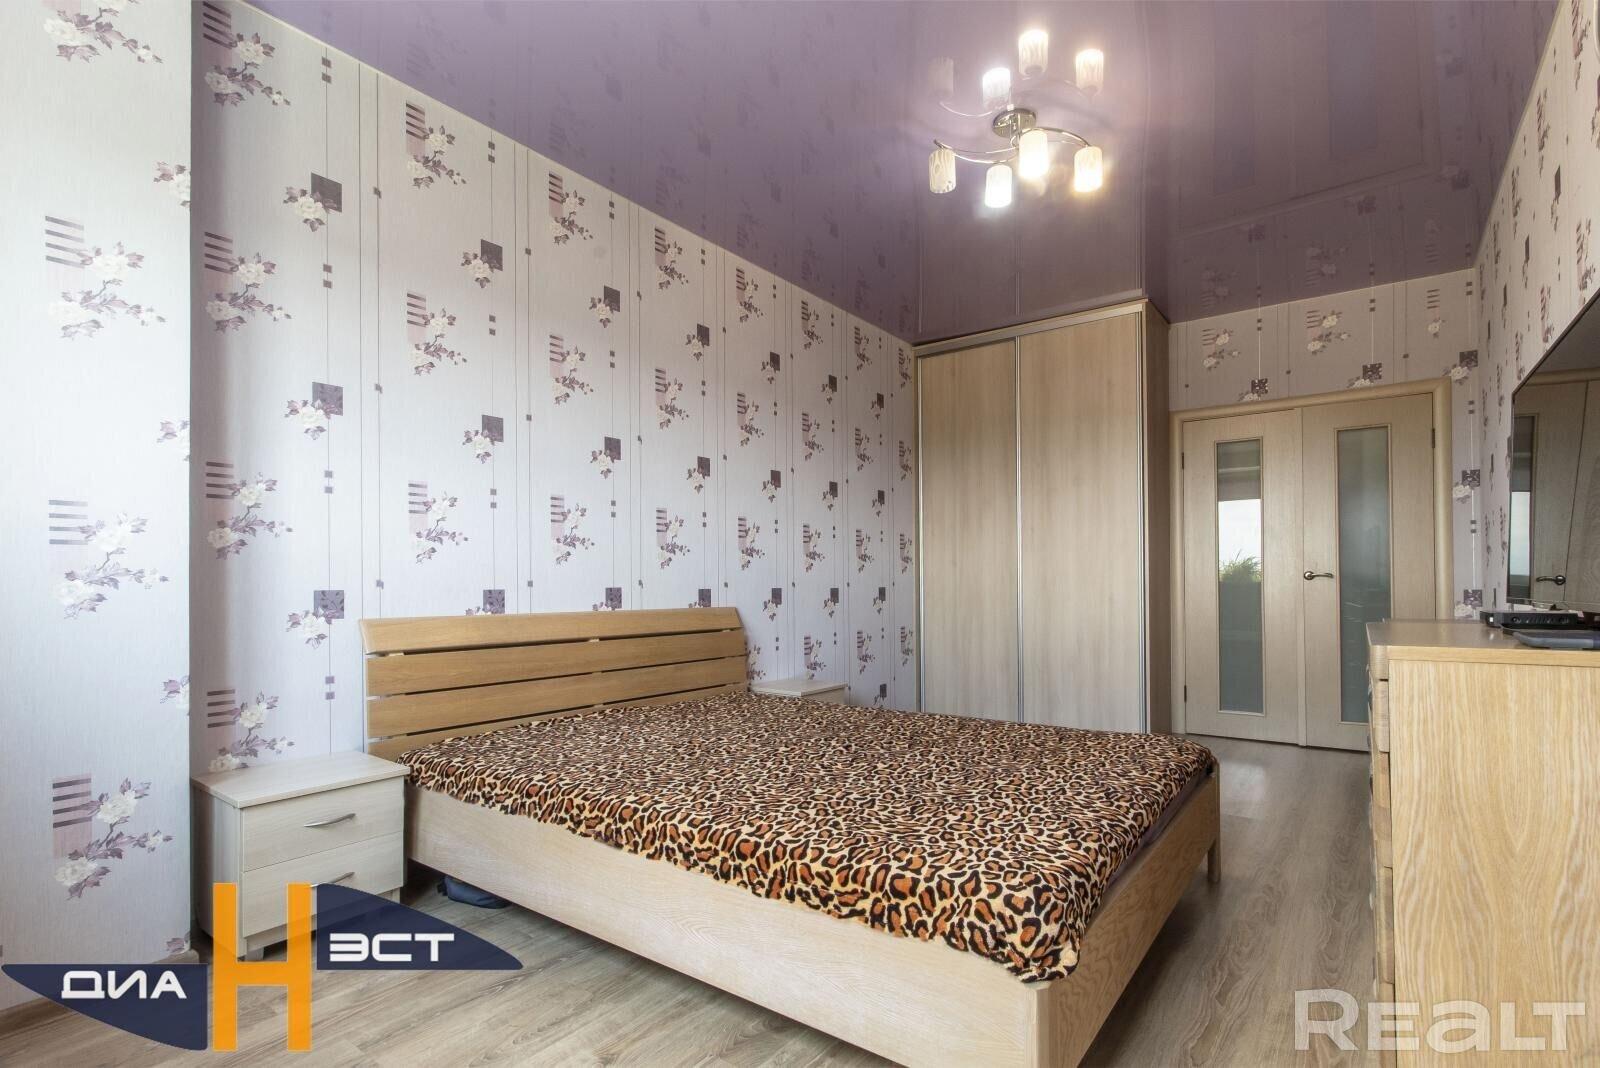 Продажа 2-х комнатной квартиры в г. Минске, ул. Рафиева (р-н Юго-Запад)